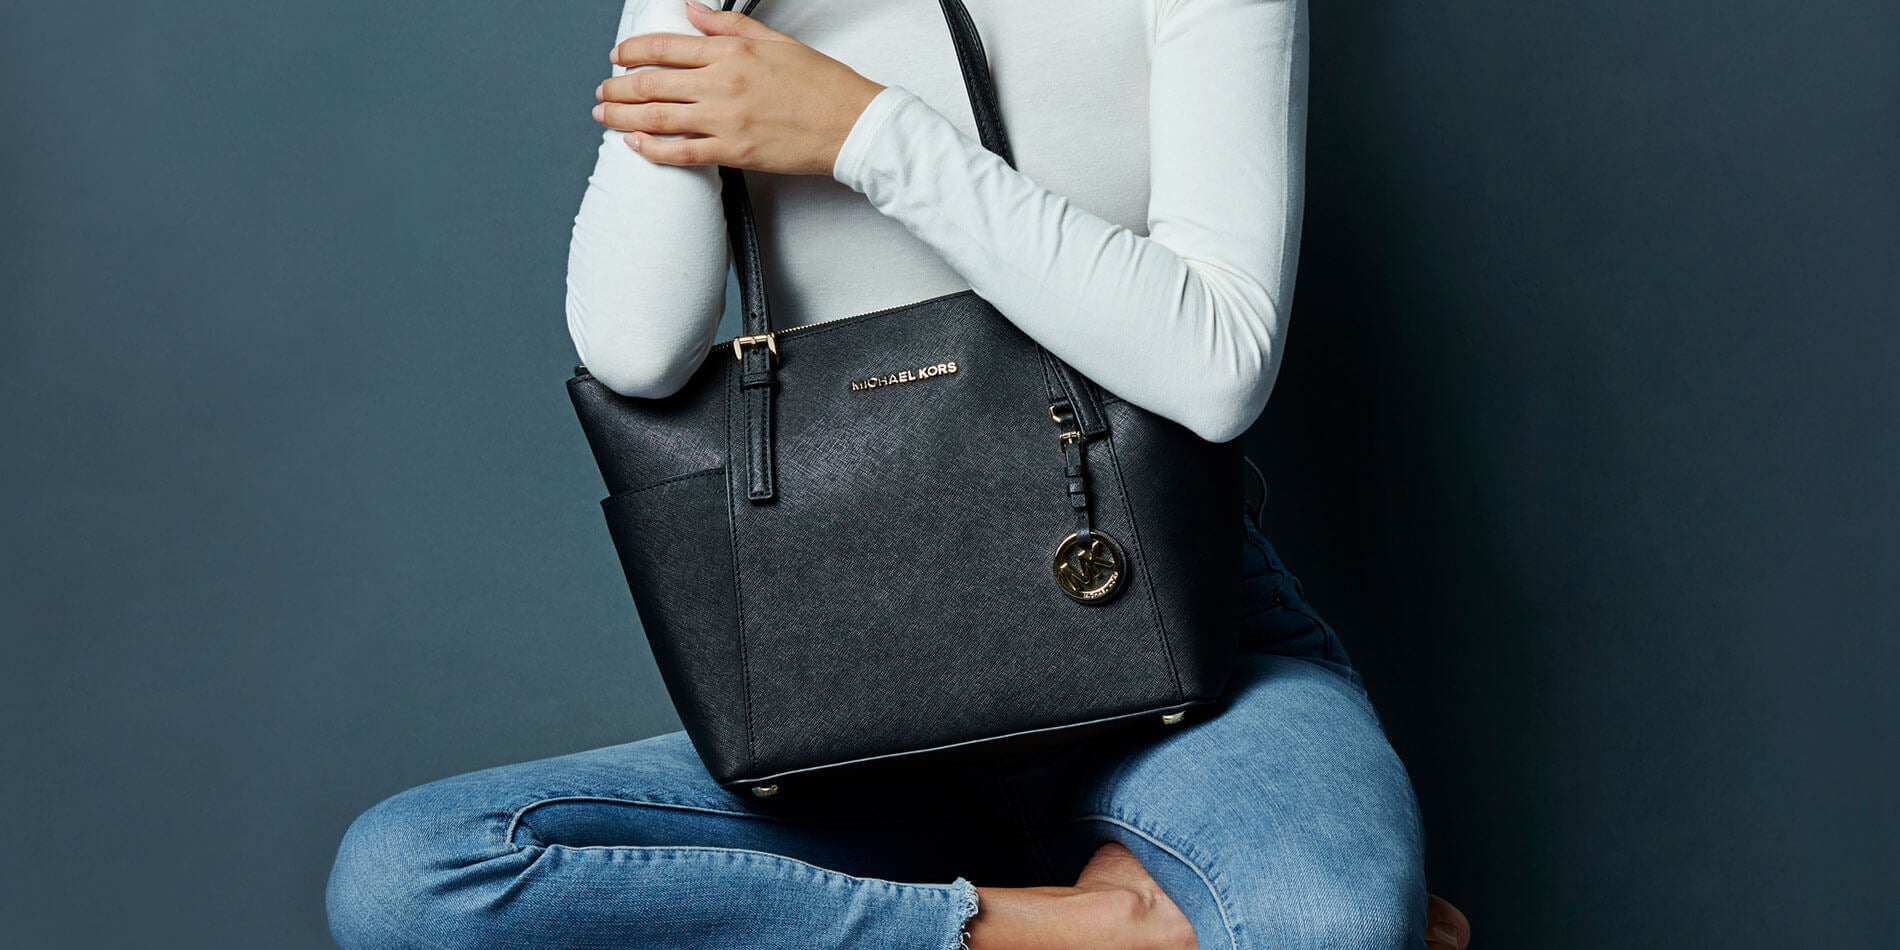 Designer Handbags   Find Great Designer Store Deals Shopping at  Overstock.com d16ecf3a94